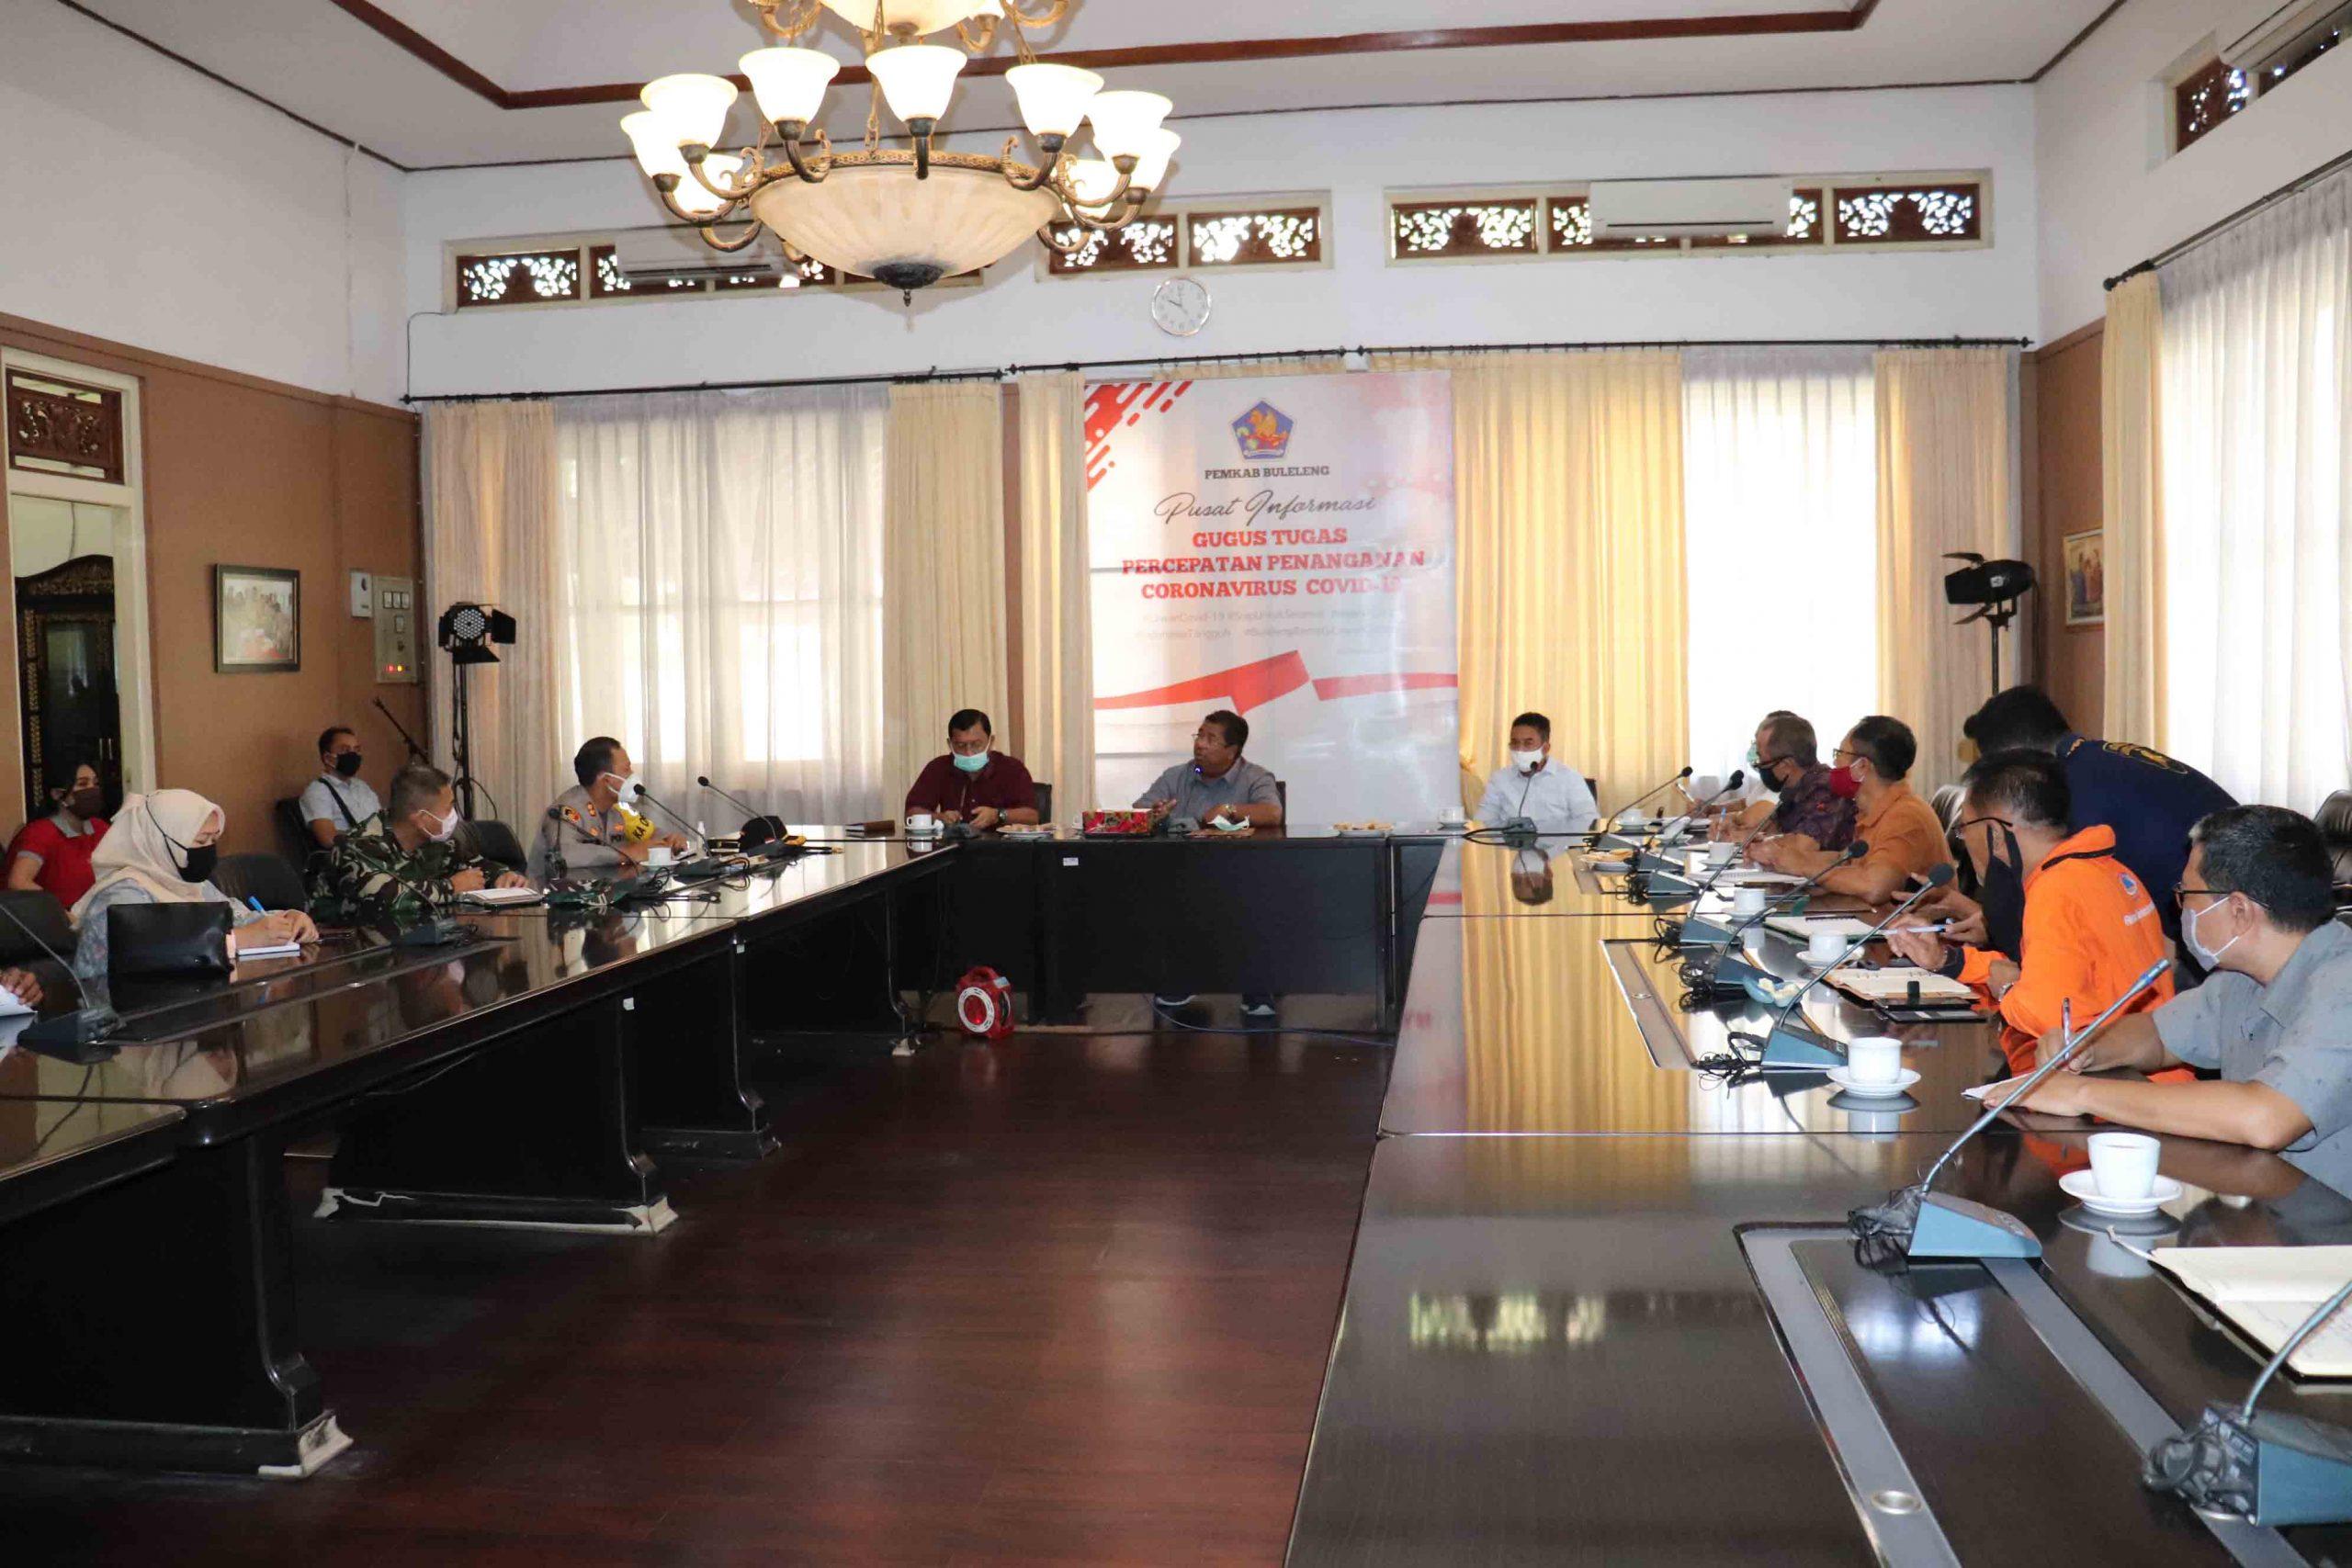 RAPAT kordinasi antara Gugus Tugas Percepatan Penanganan Covid-19 Buleleng membahas pencabutan status karantina wilayah Desa Bondalem, Buleleng. Foto: arik